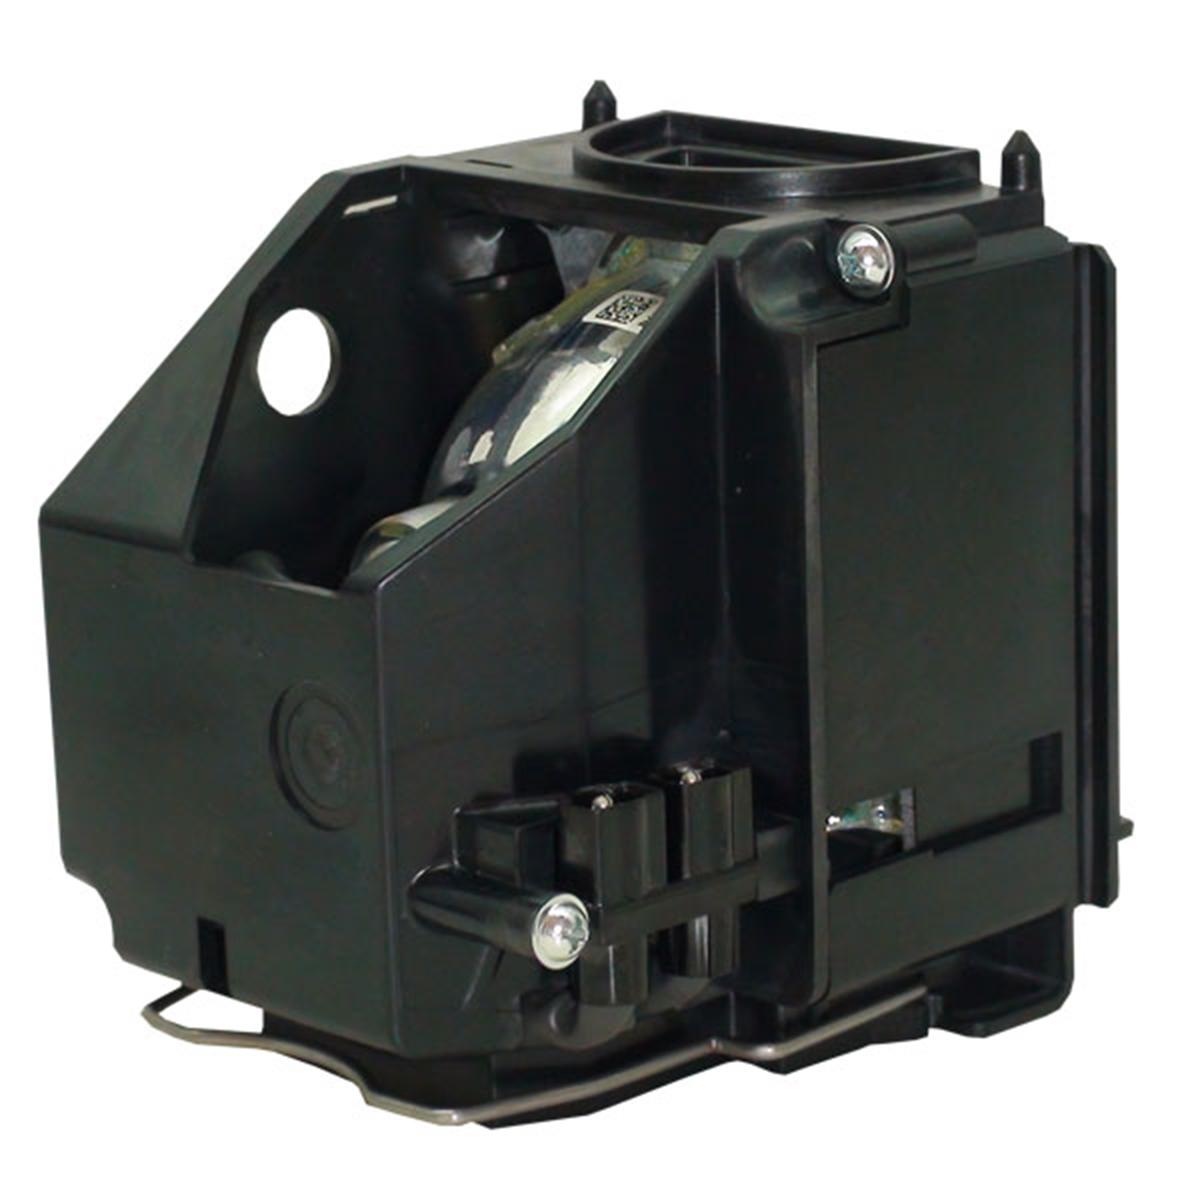 01472a replacement bulb cartridge for samsung hls5687w tv lamp ebay. Black Bedroom Furniture Sets. Home Design Ideas